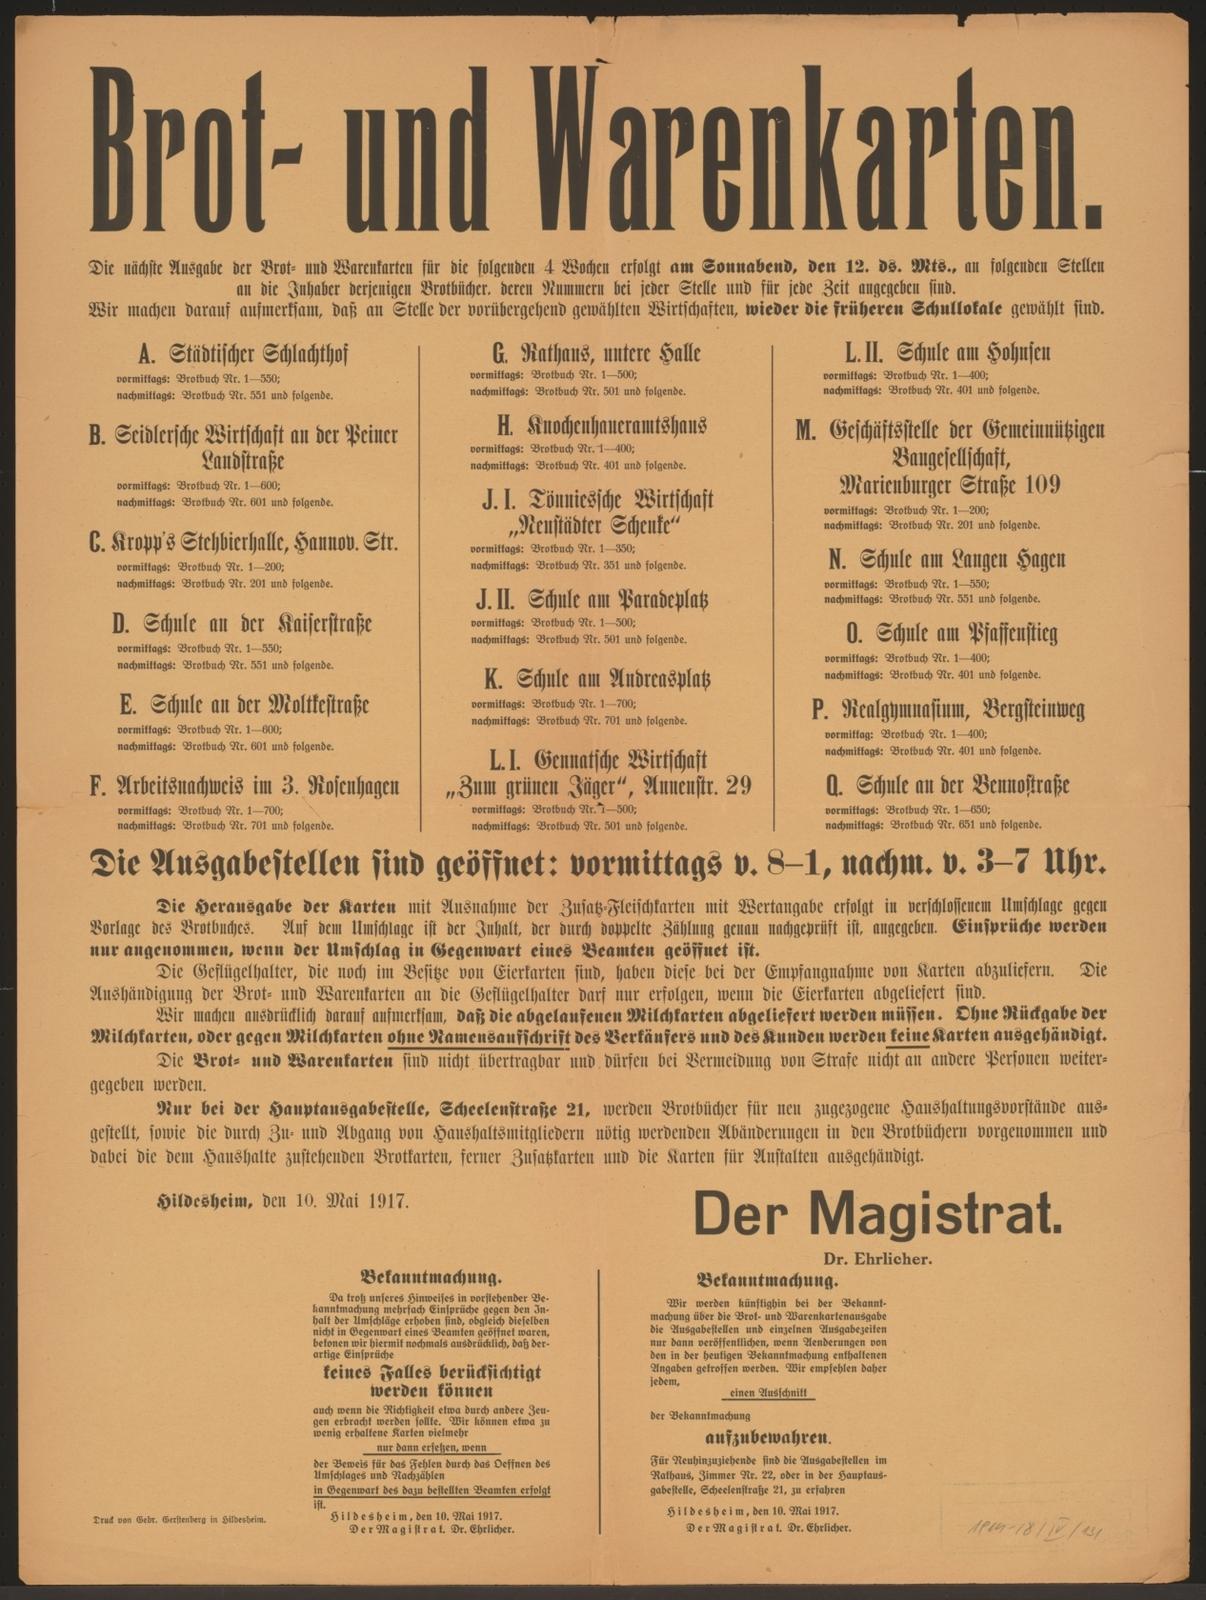 Medialandwehr Inspektion Berlin Medialandwehr Medialandwehr Berlin Inspektion Inspektion m0NO8nwv